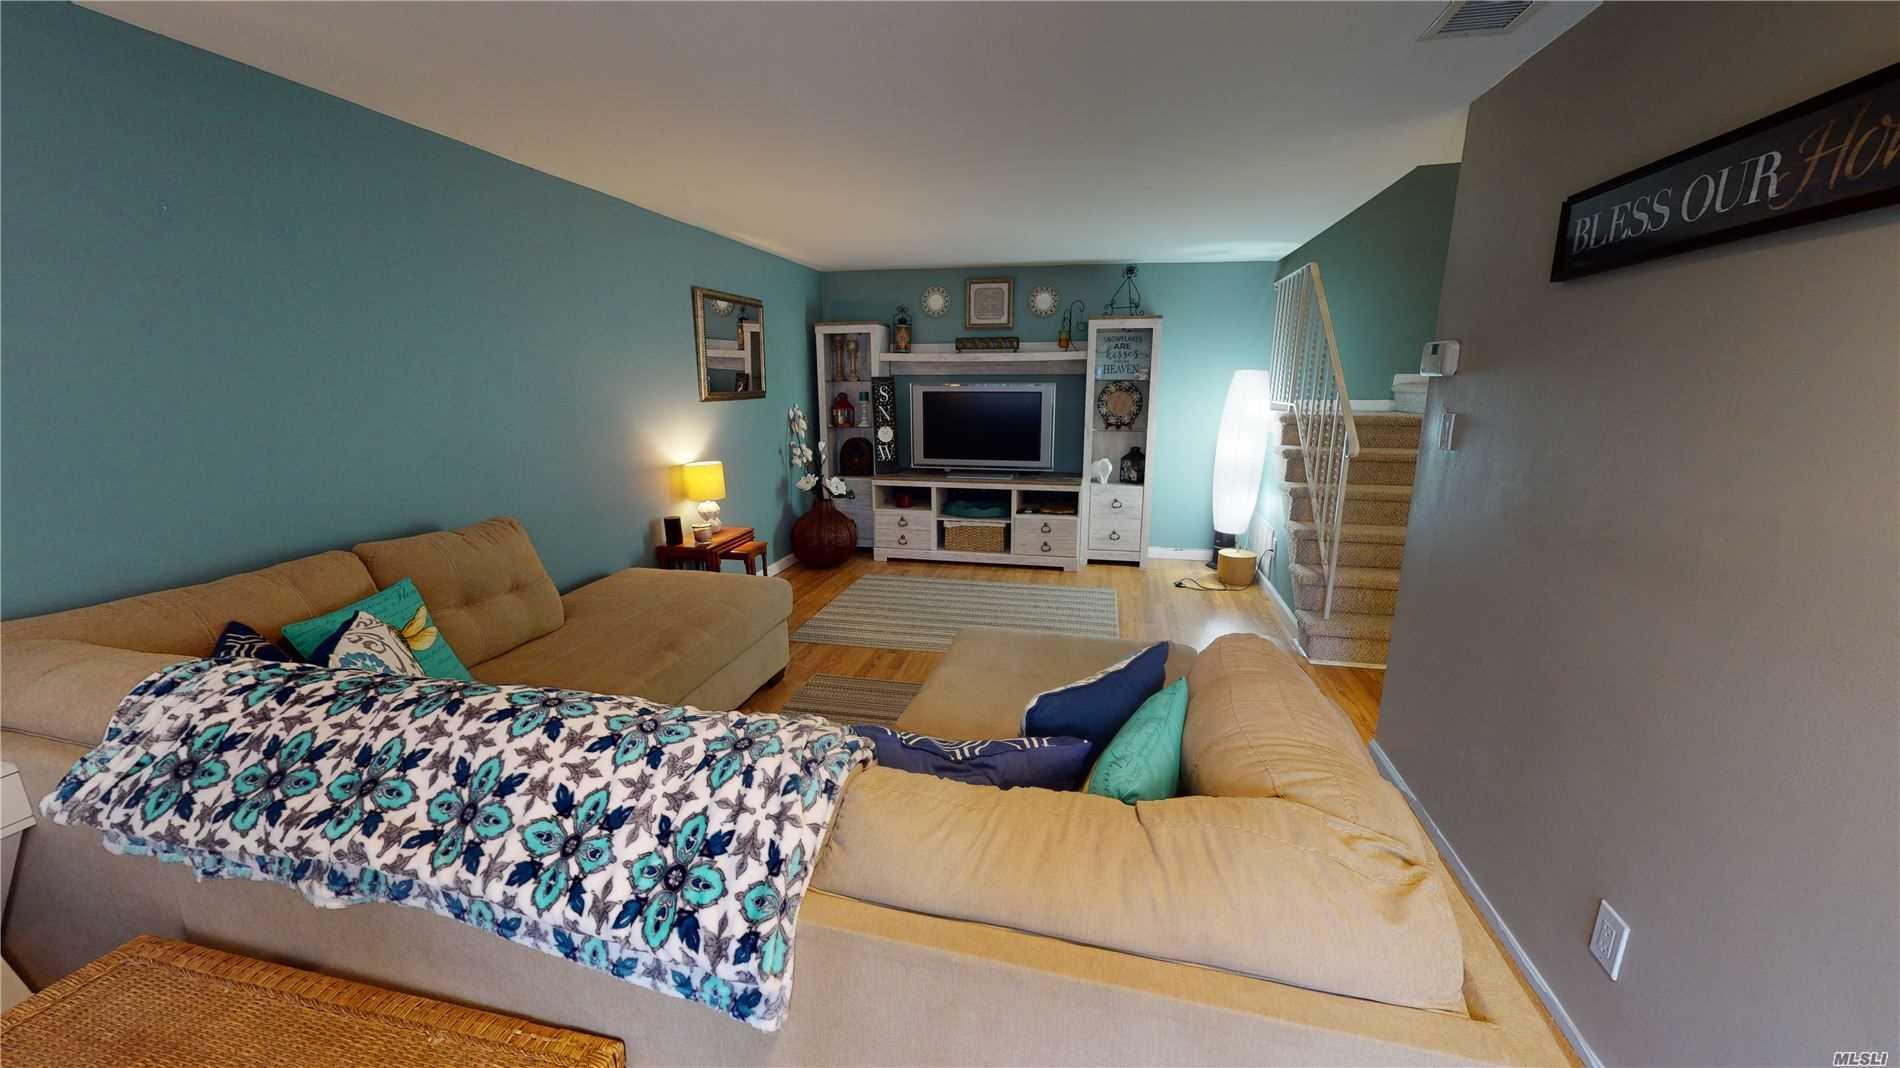 Property for sale at 140 Glen Hollow Drive, Pt.Jefferson Sta NY 11776, Pt.Jefferson Sta,  New York 11776